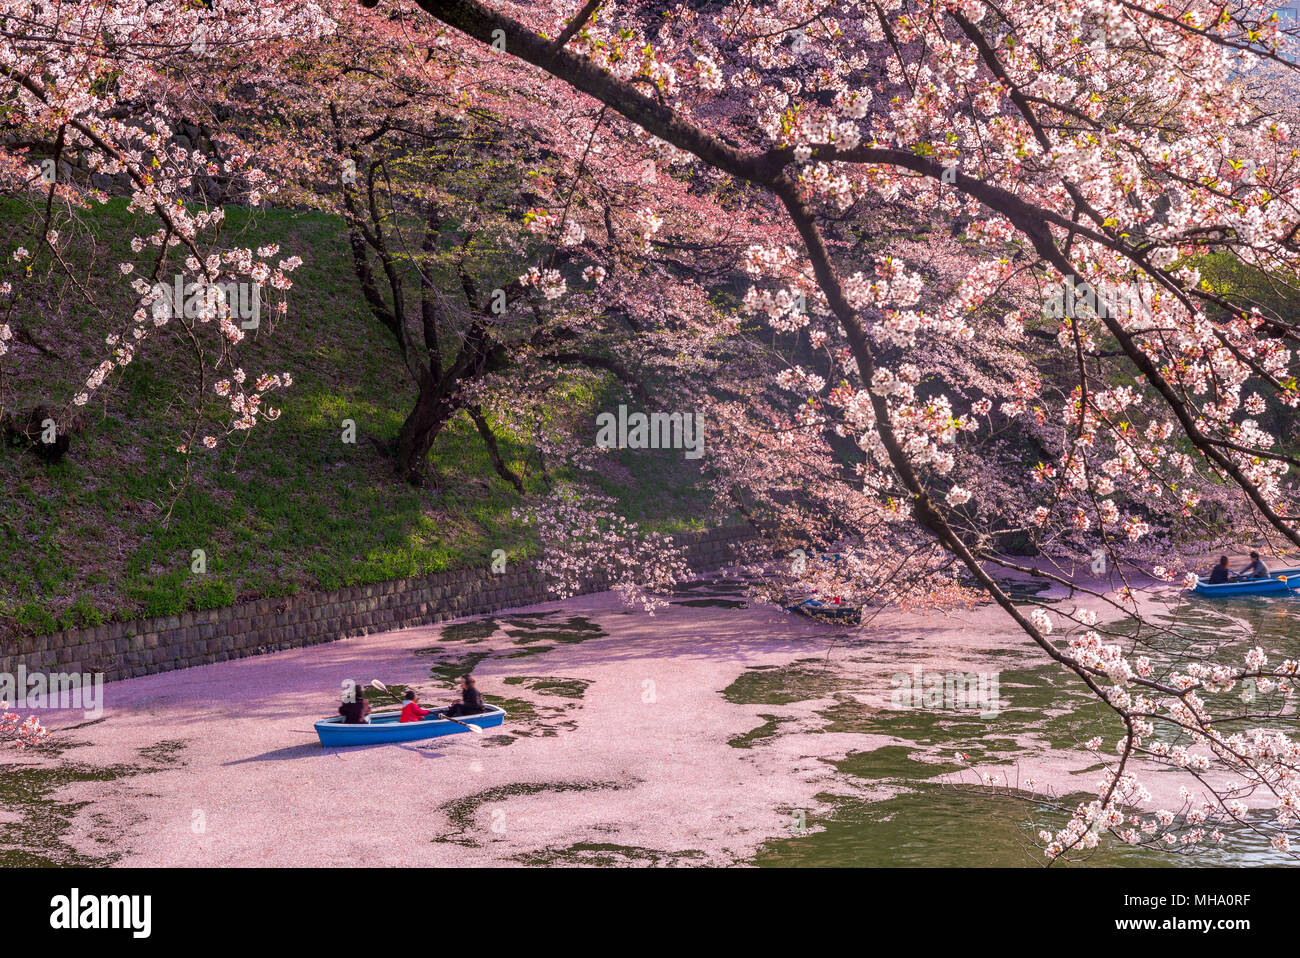 cherry blossom at chidori ga fuchi, tokyo, japan - Stock Image